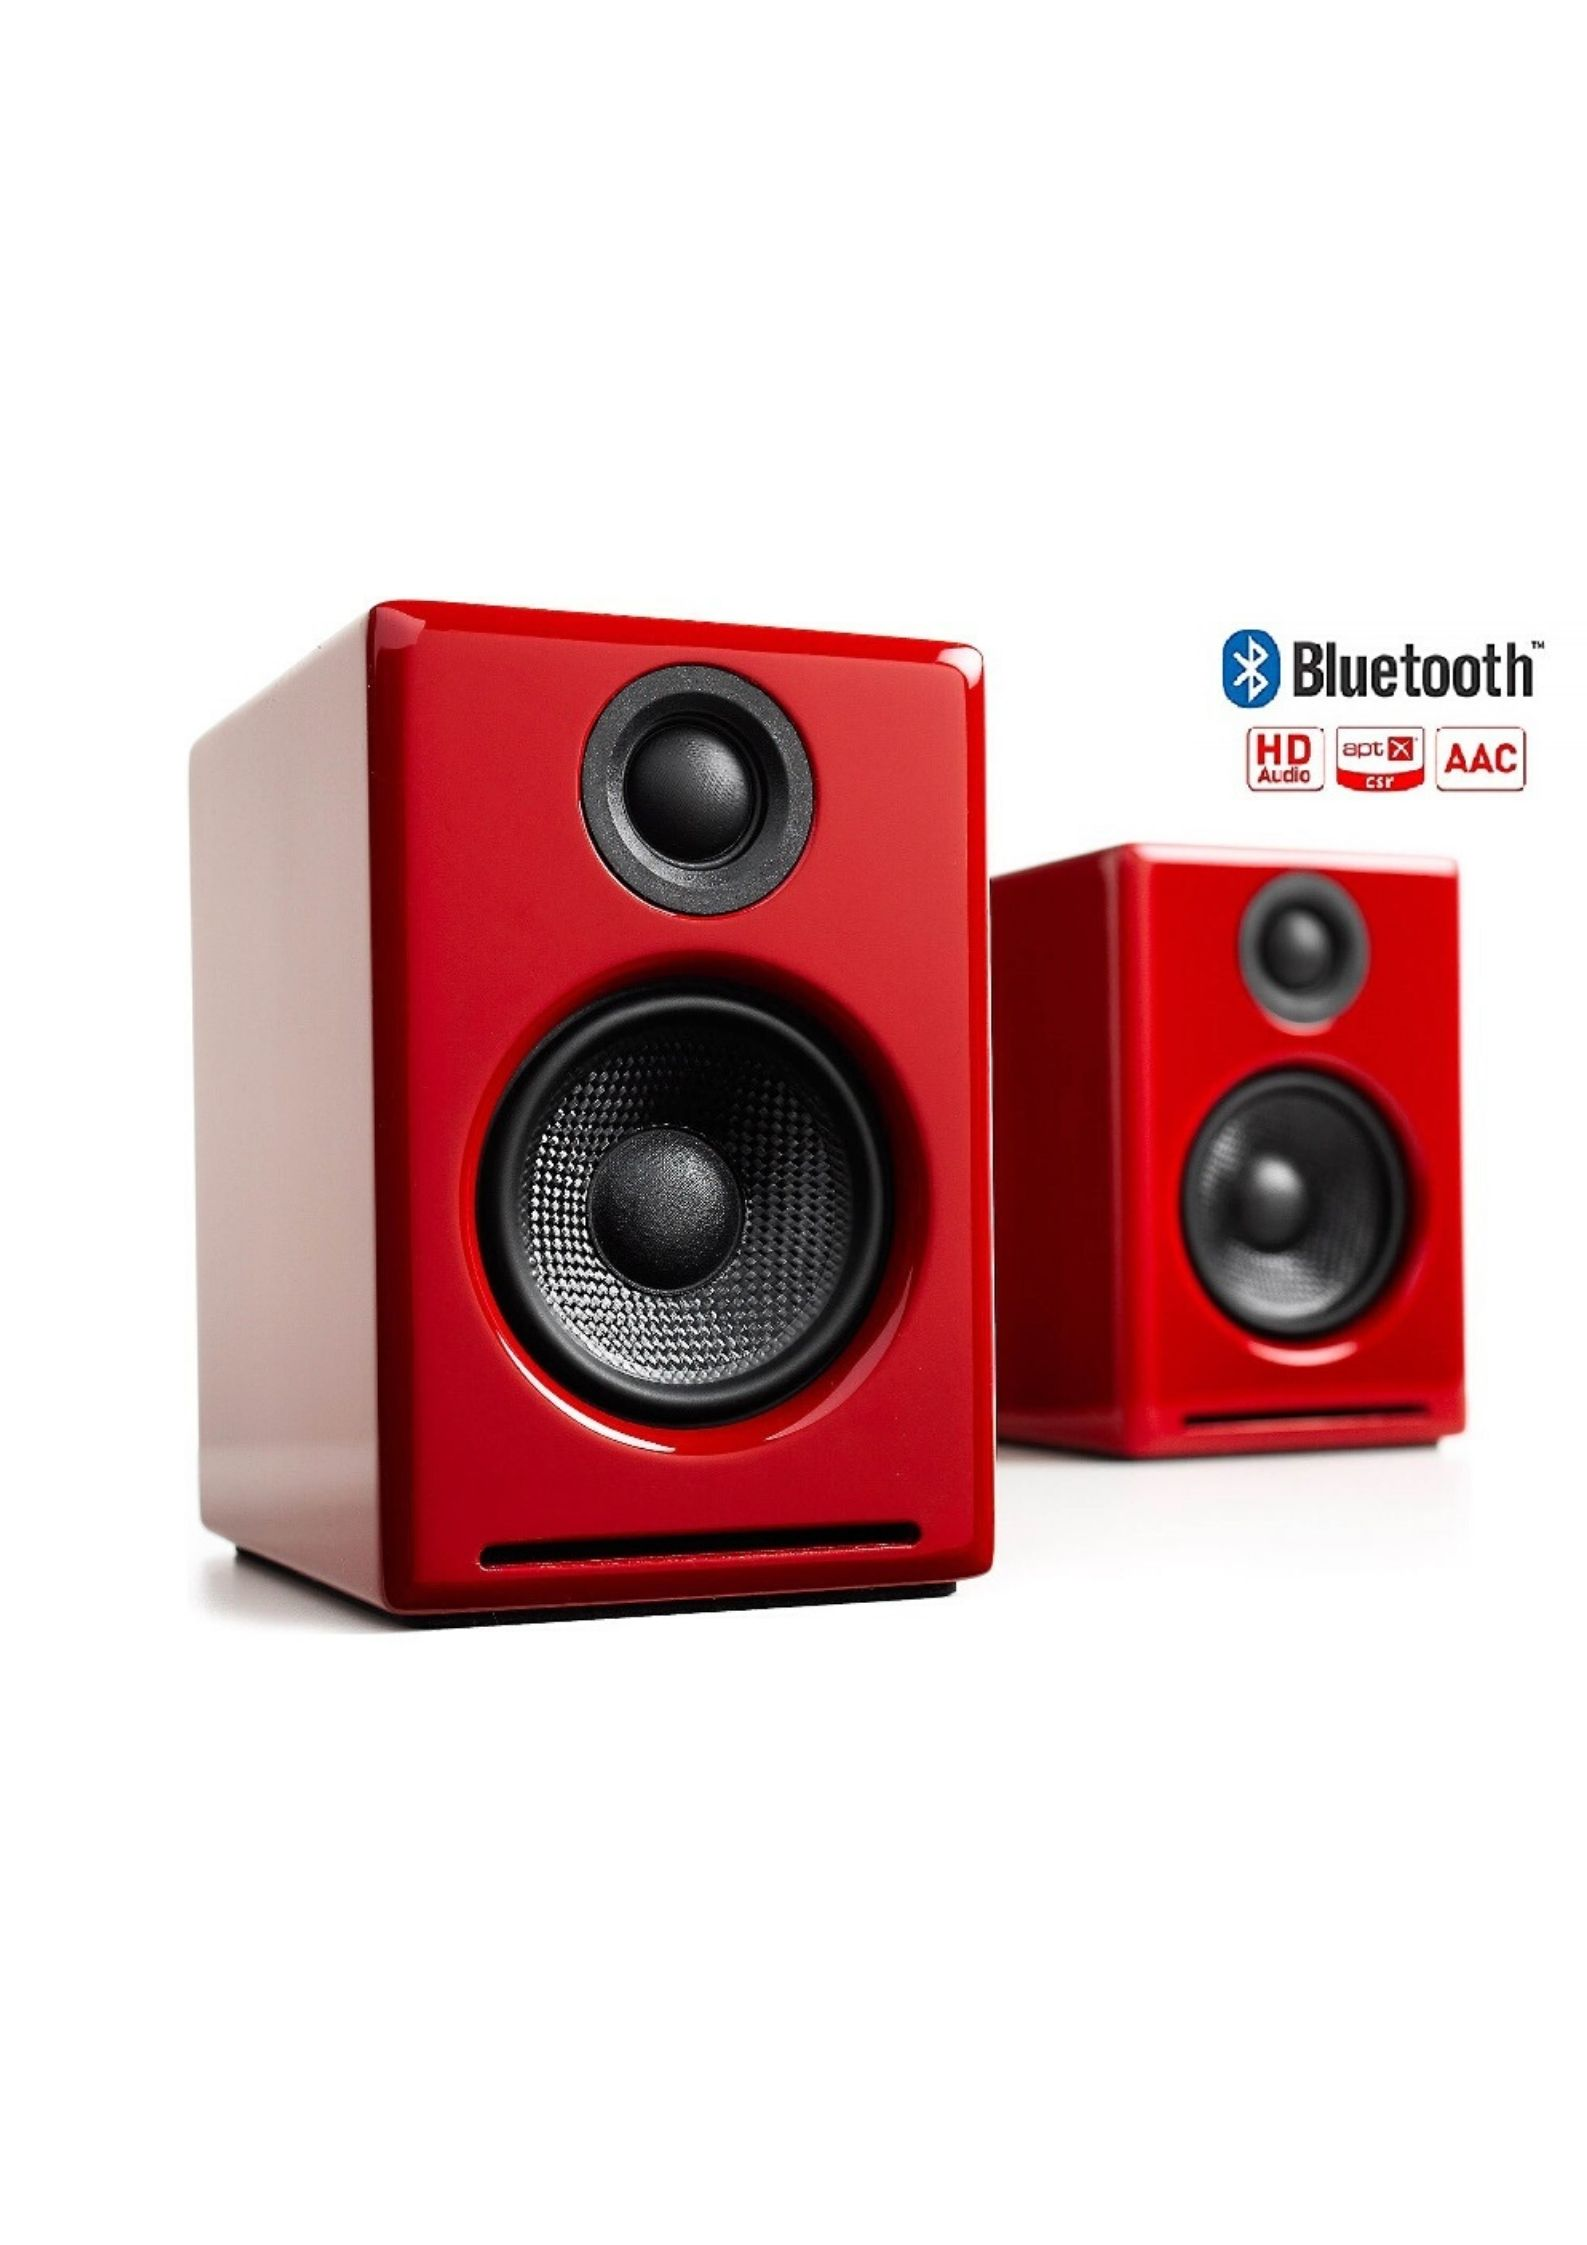 Audioengine A2+Wireless Ασύρματα Αυτοενισχυόμενα Ηχεία Υπολογιστή Gloss Red